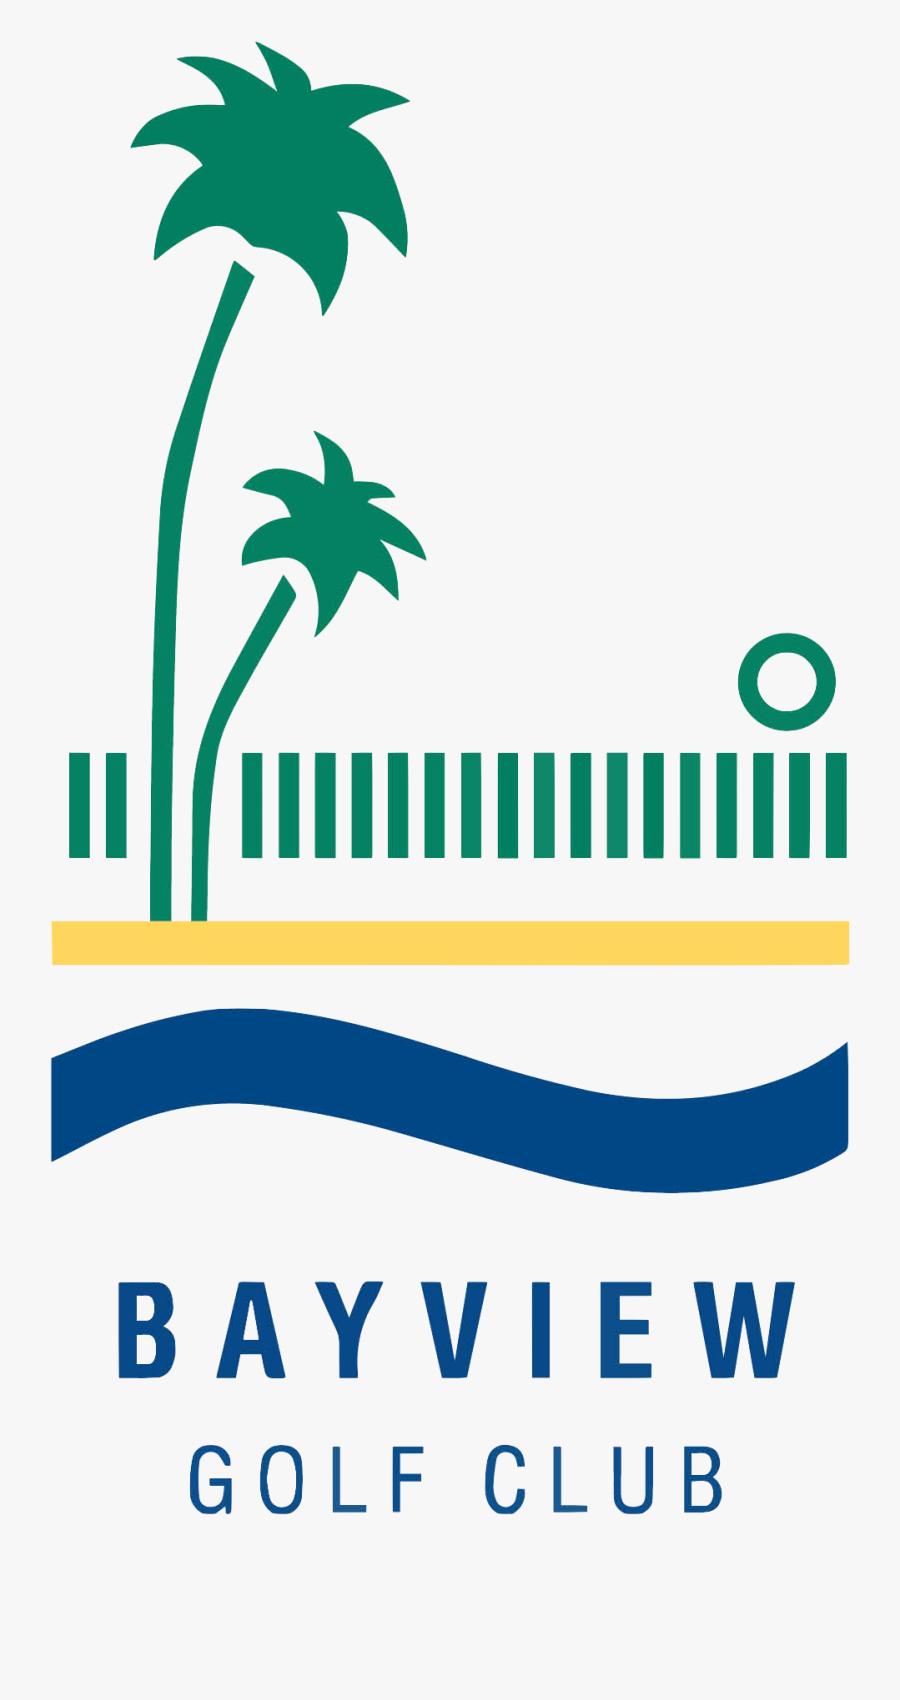 Bayview Golf Club Logo Clipart , Png Download - Bayview Golf Club, Transparent Clipart